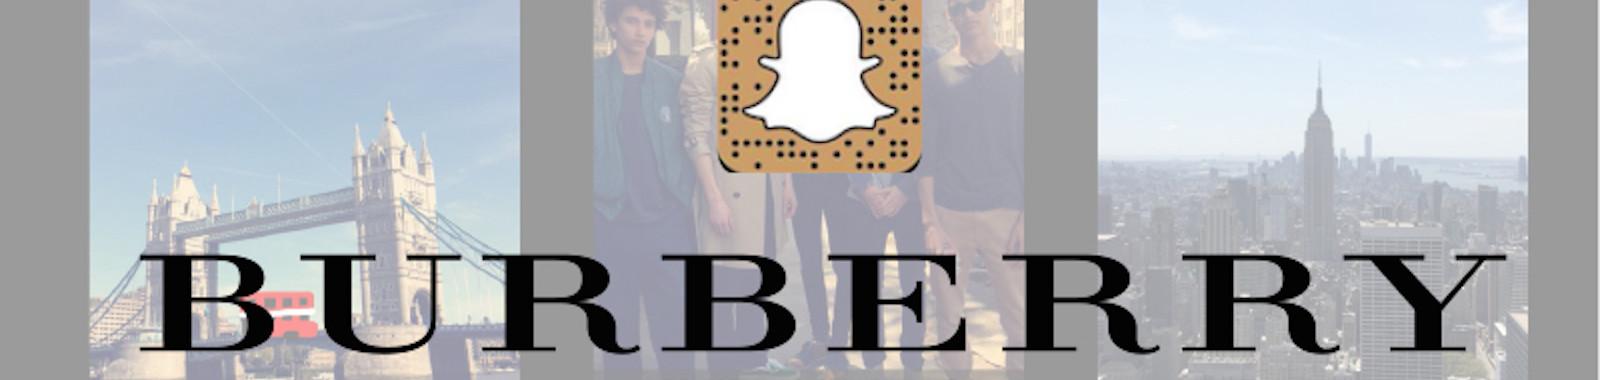 BurberrySnapchatBanner-1600x380